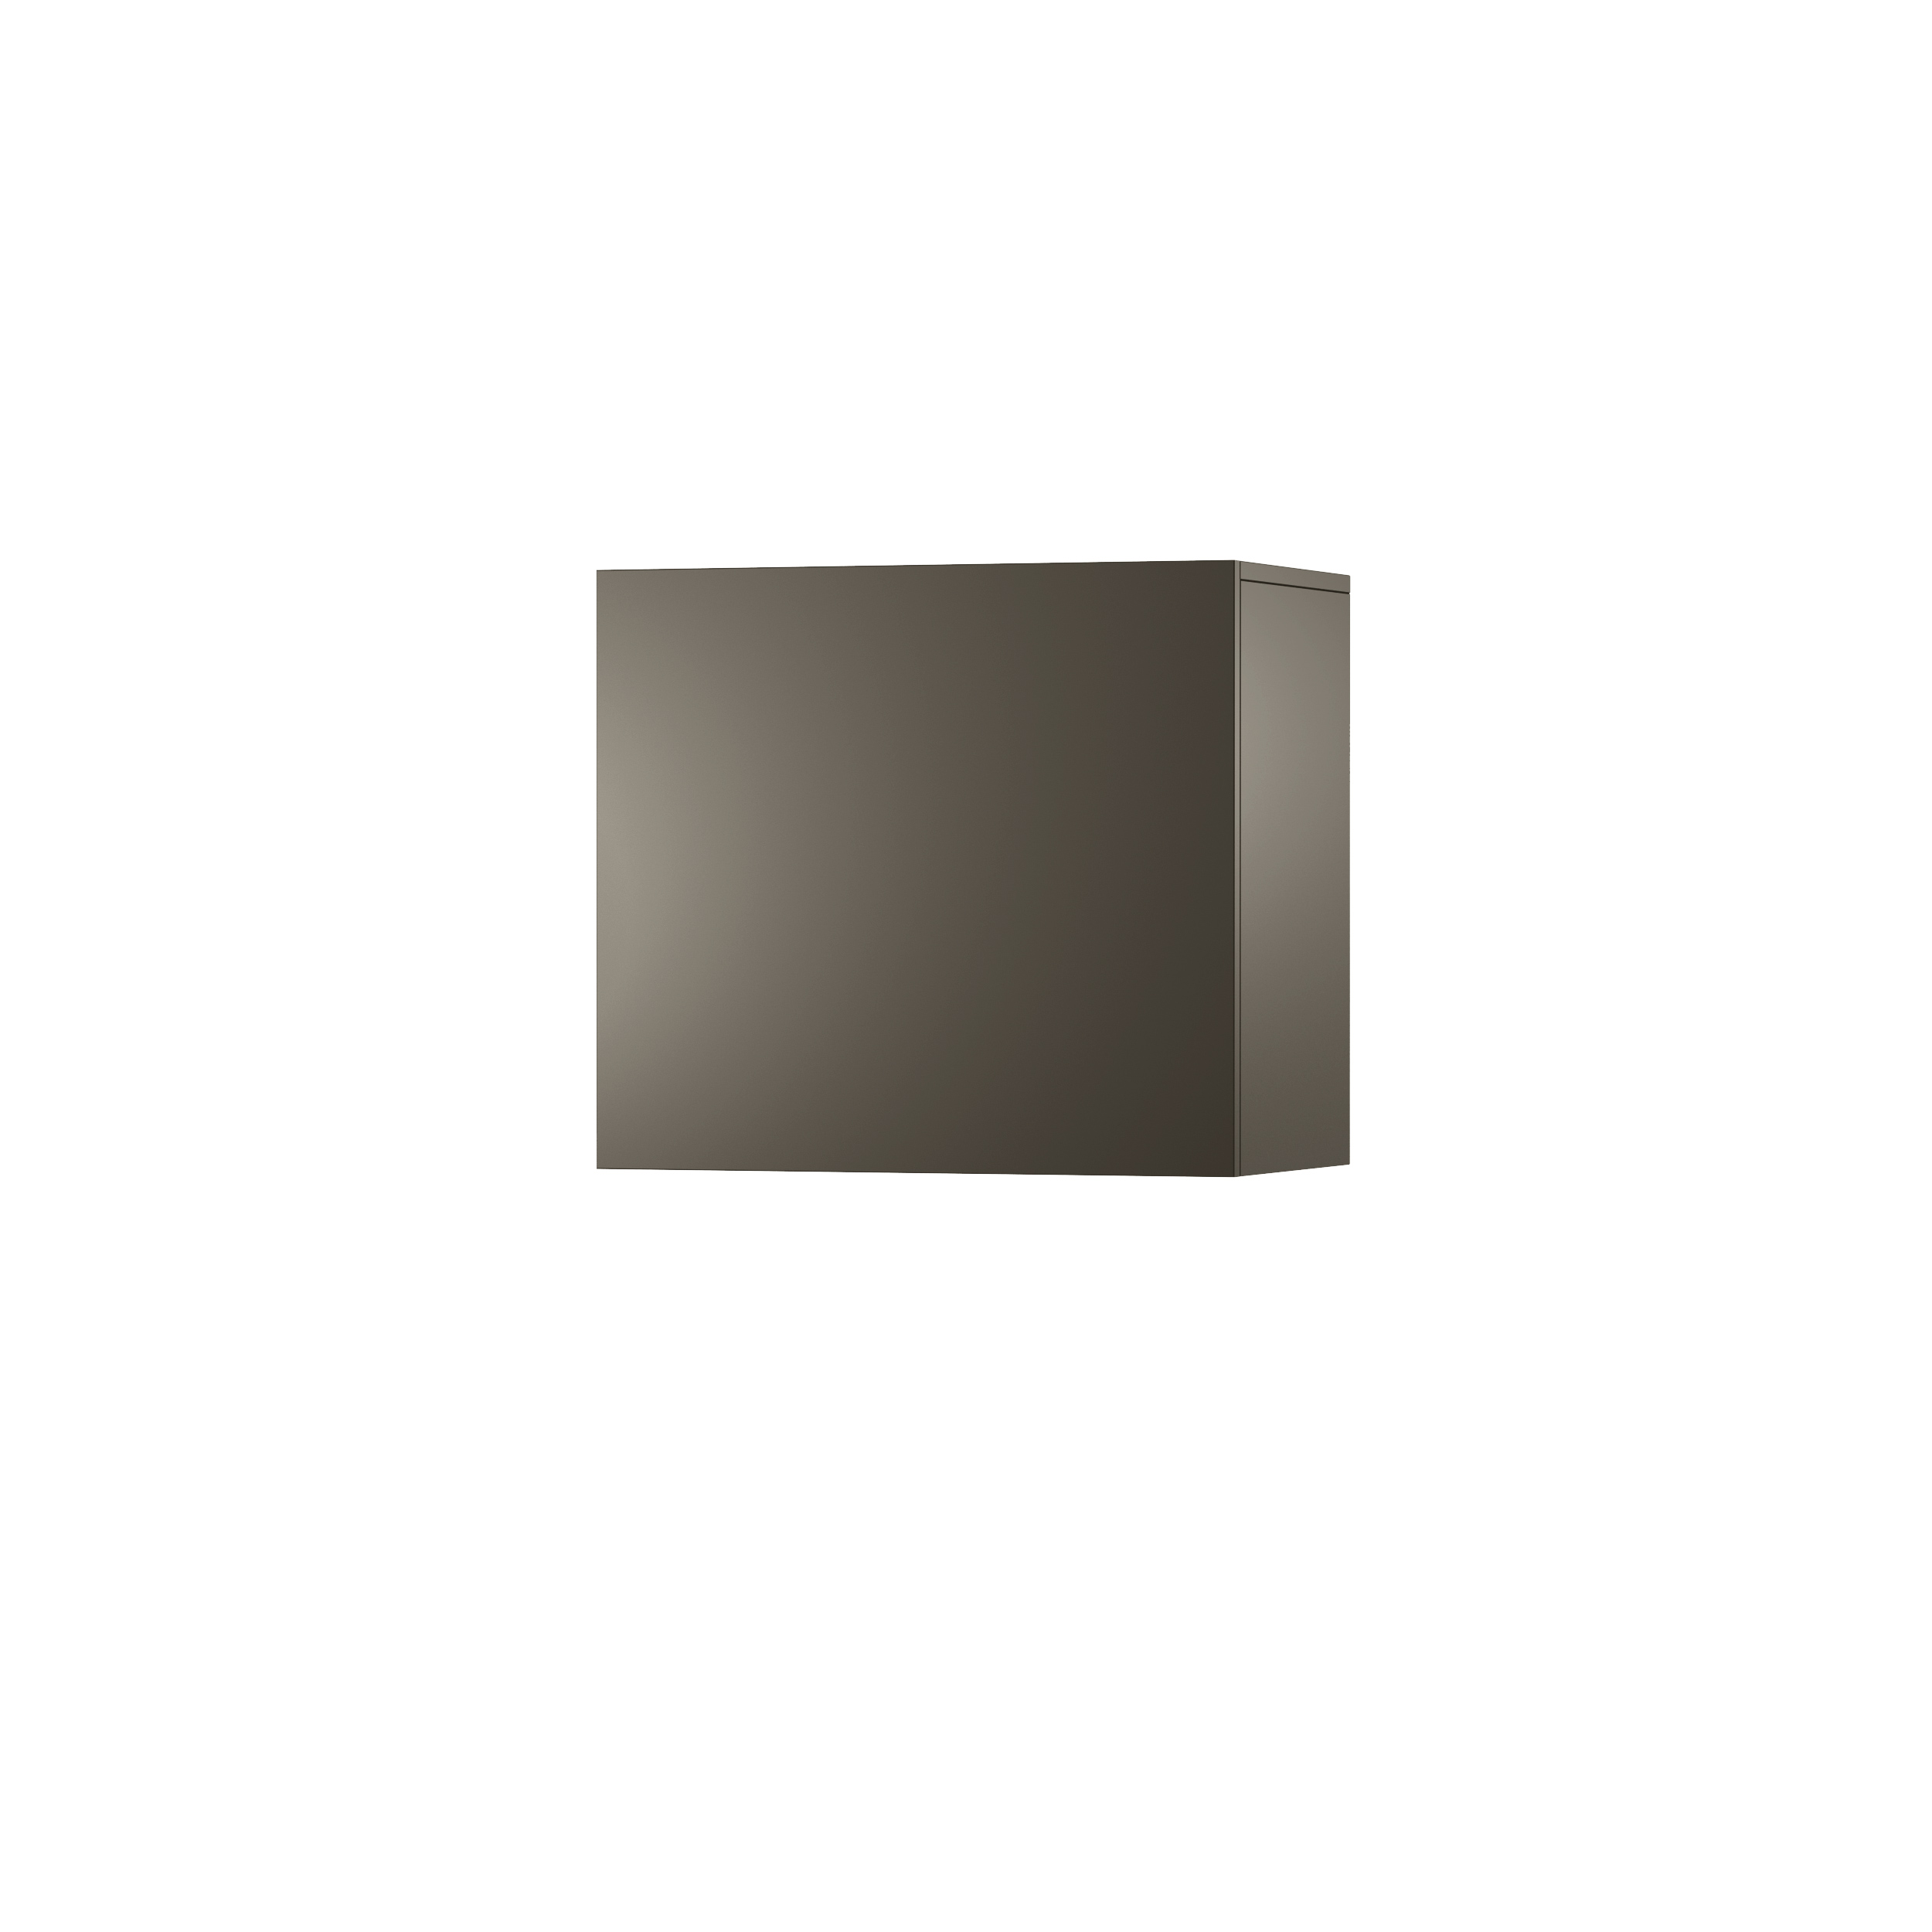 Dulap modular Nook Wide Graphite l65xA37xH58 cm